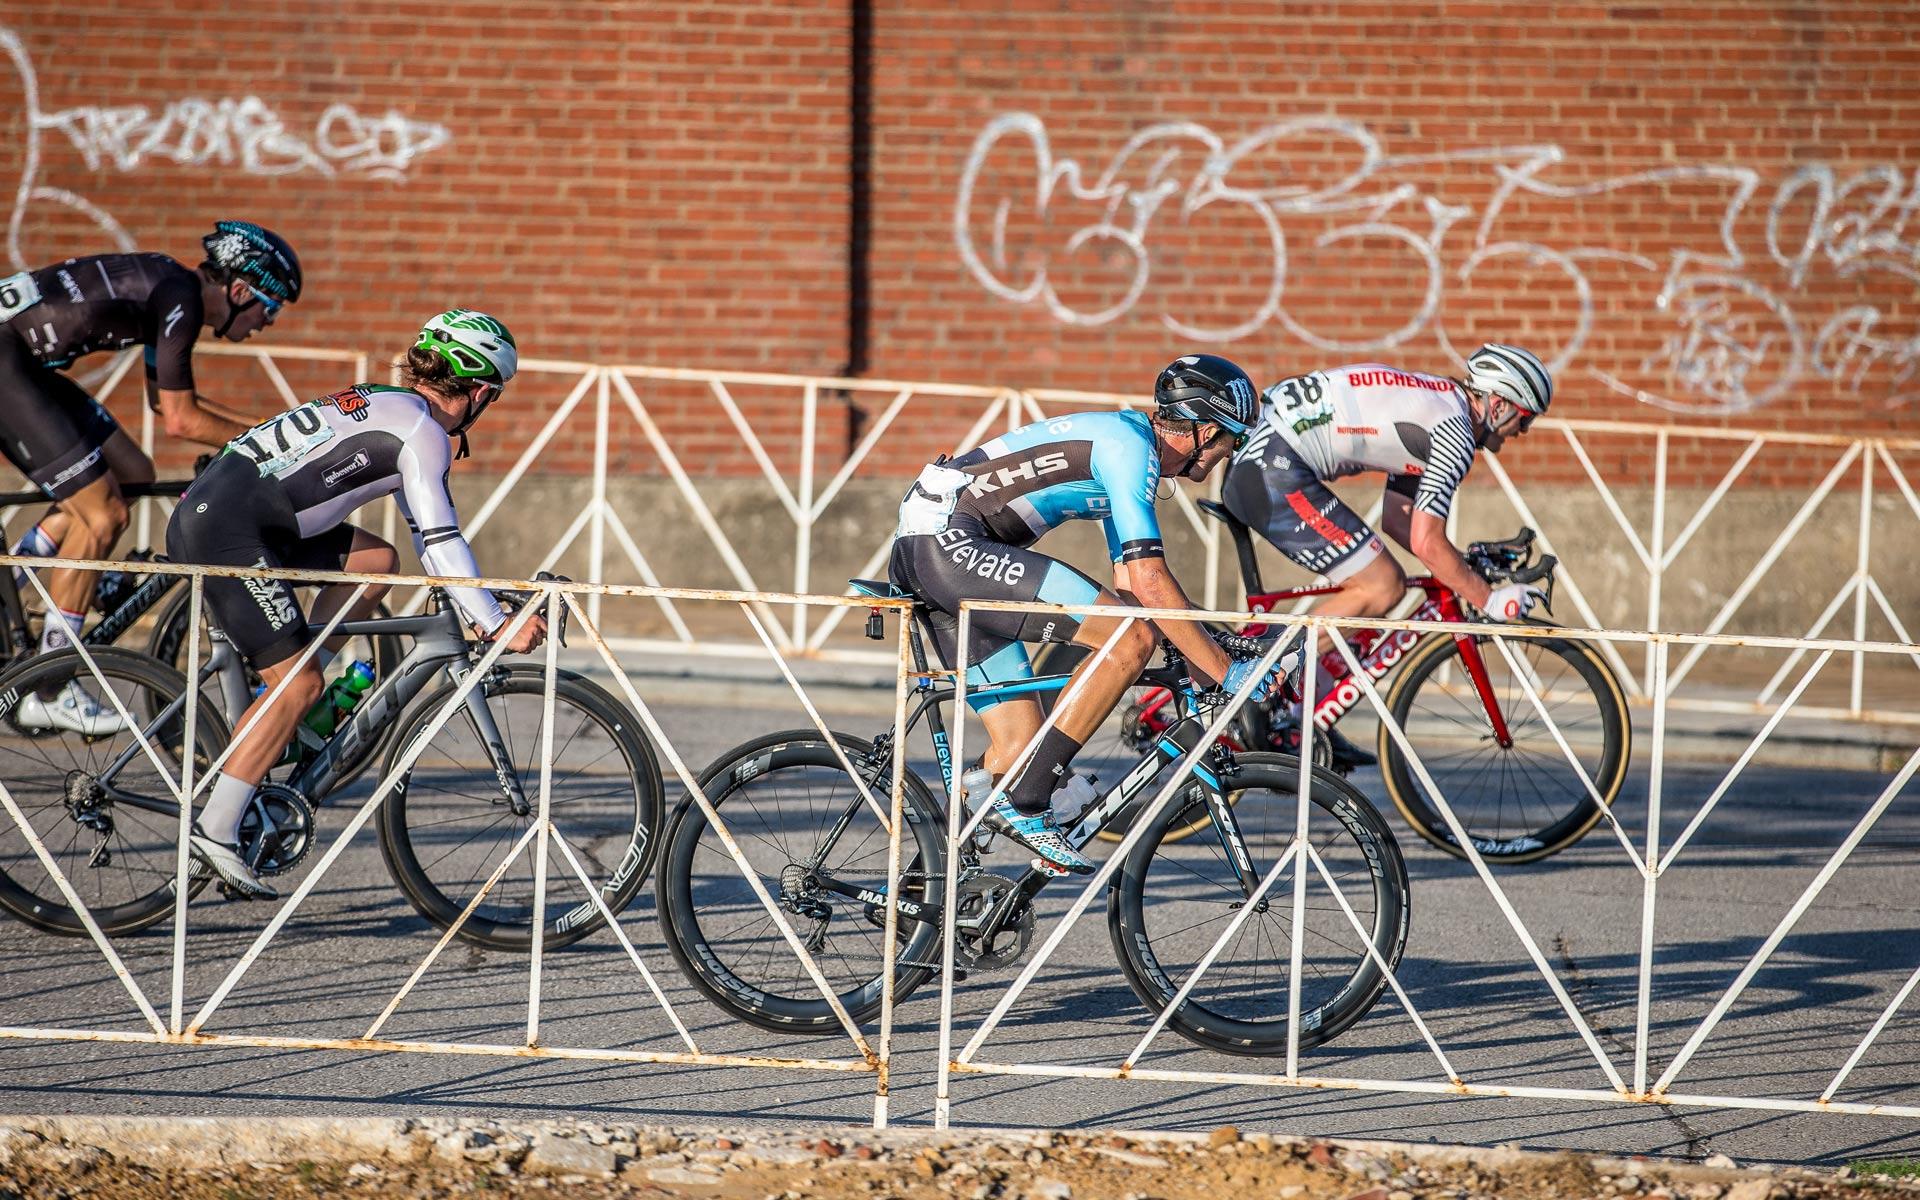 khs-bicycles-masthead-2020-khs-bricks